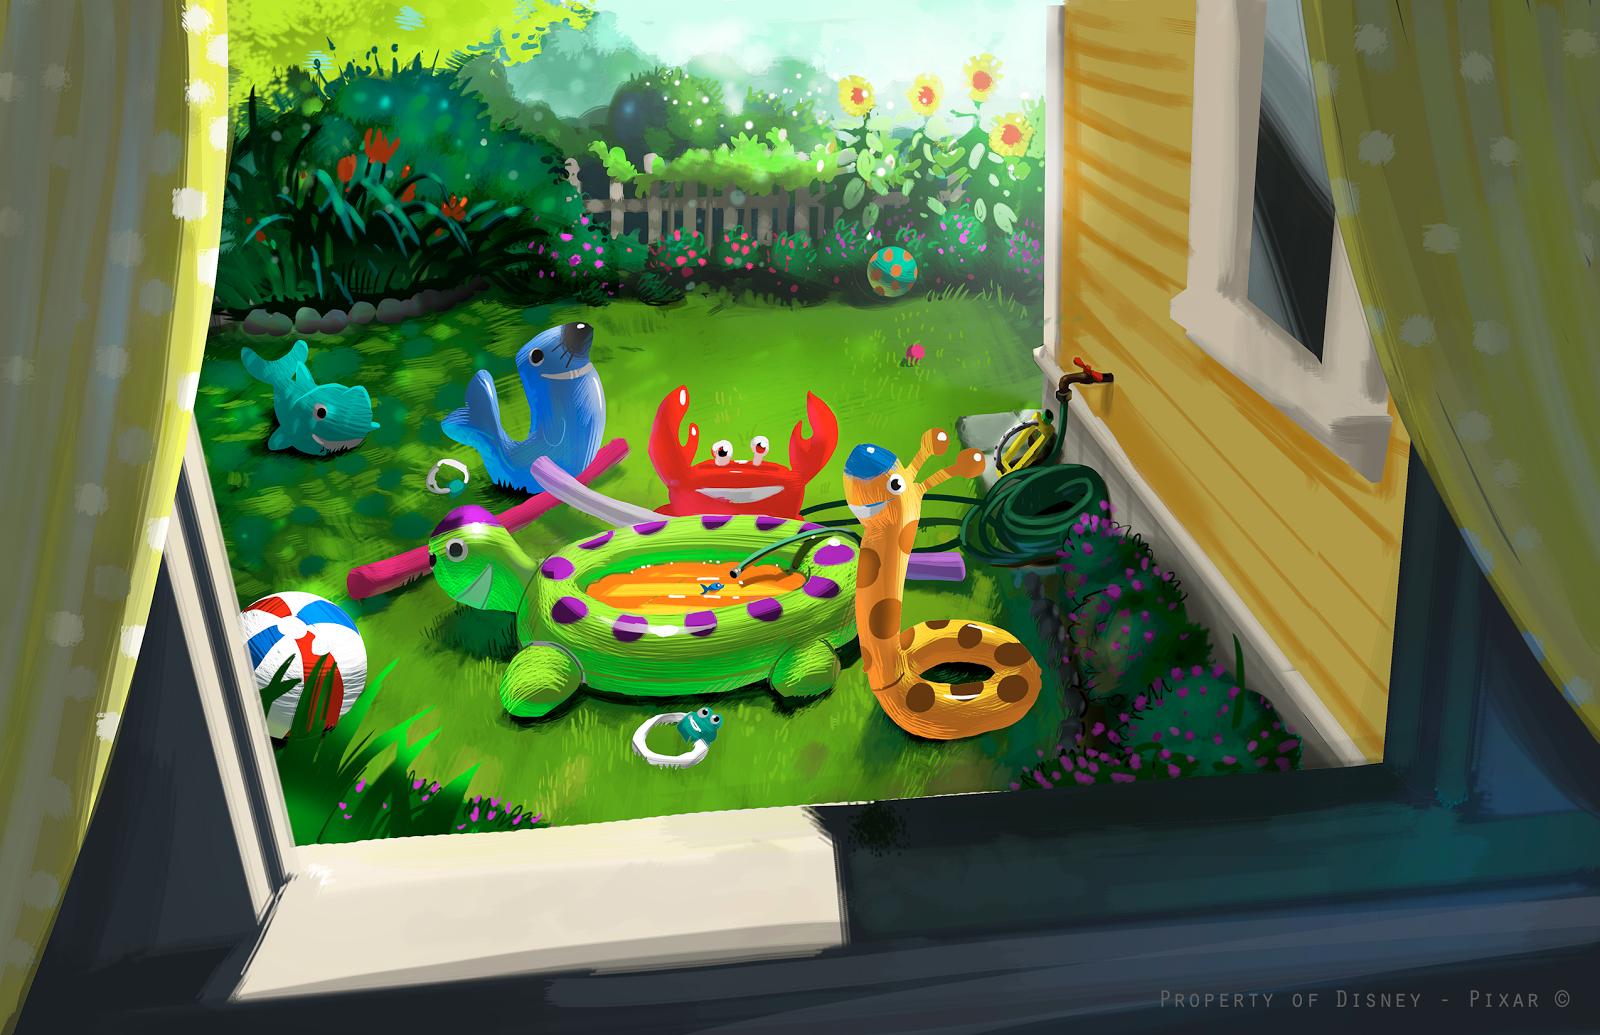 Pixar planet disney artwork Toy Story Toons partysaurus rex